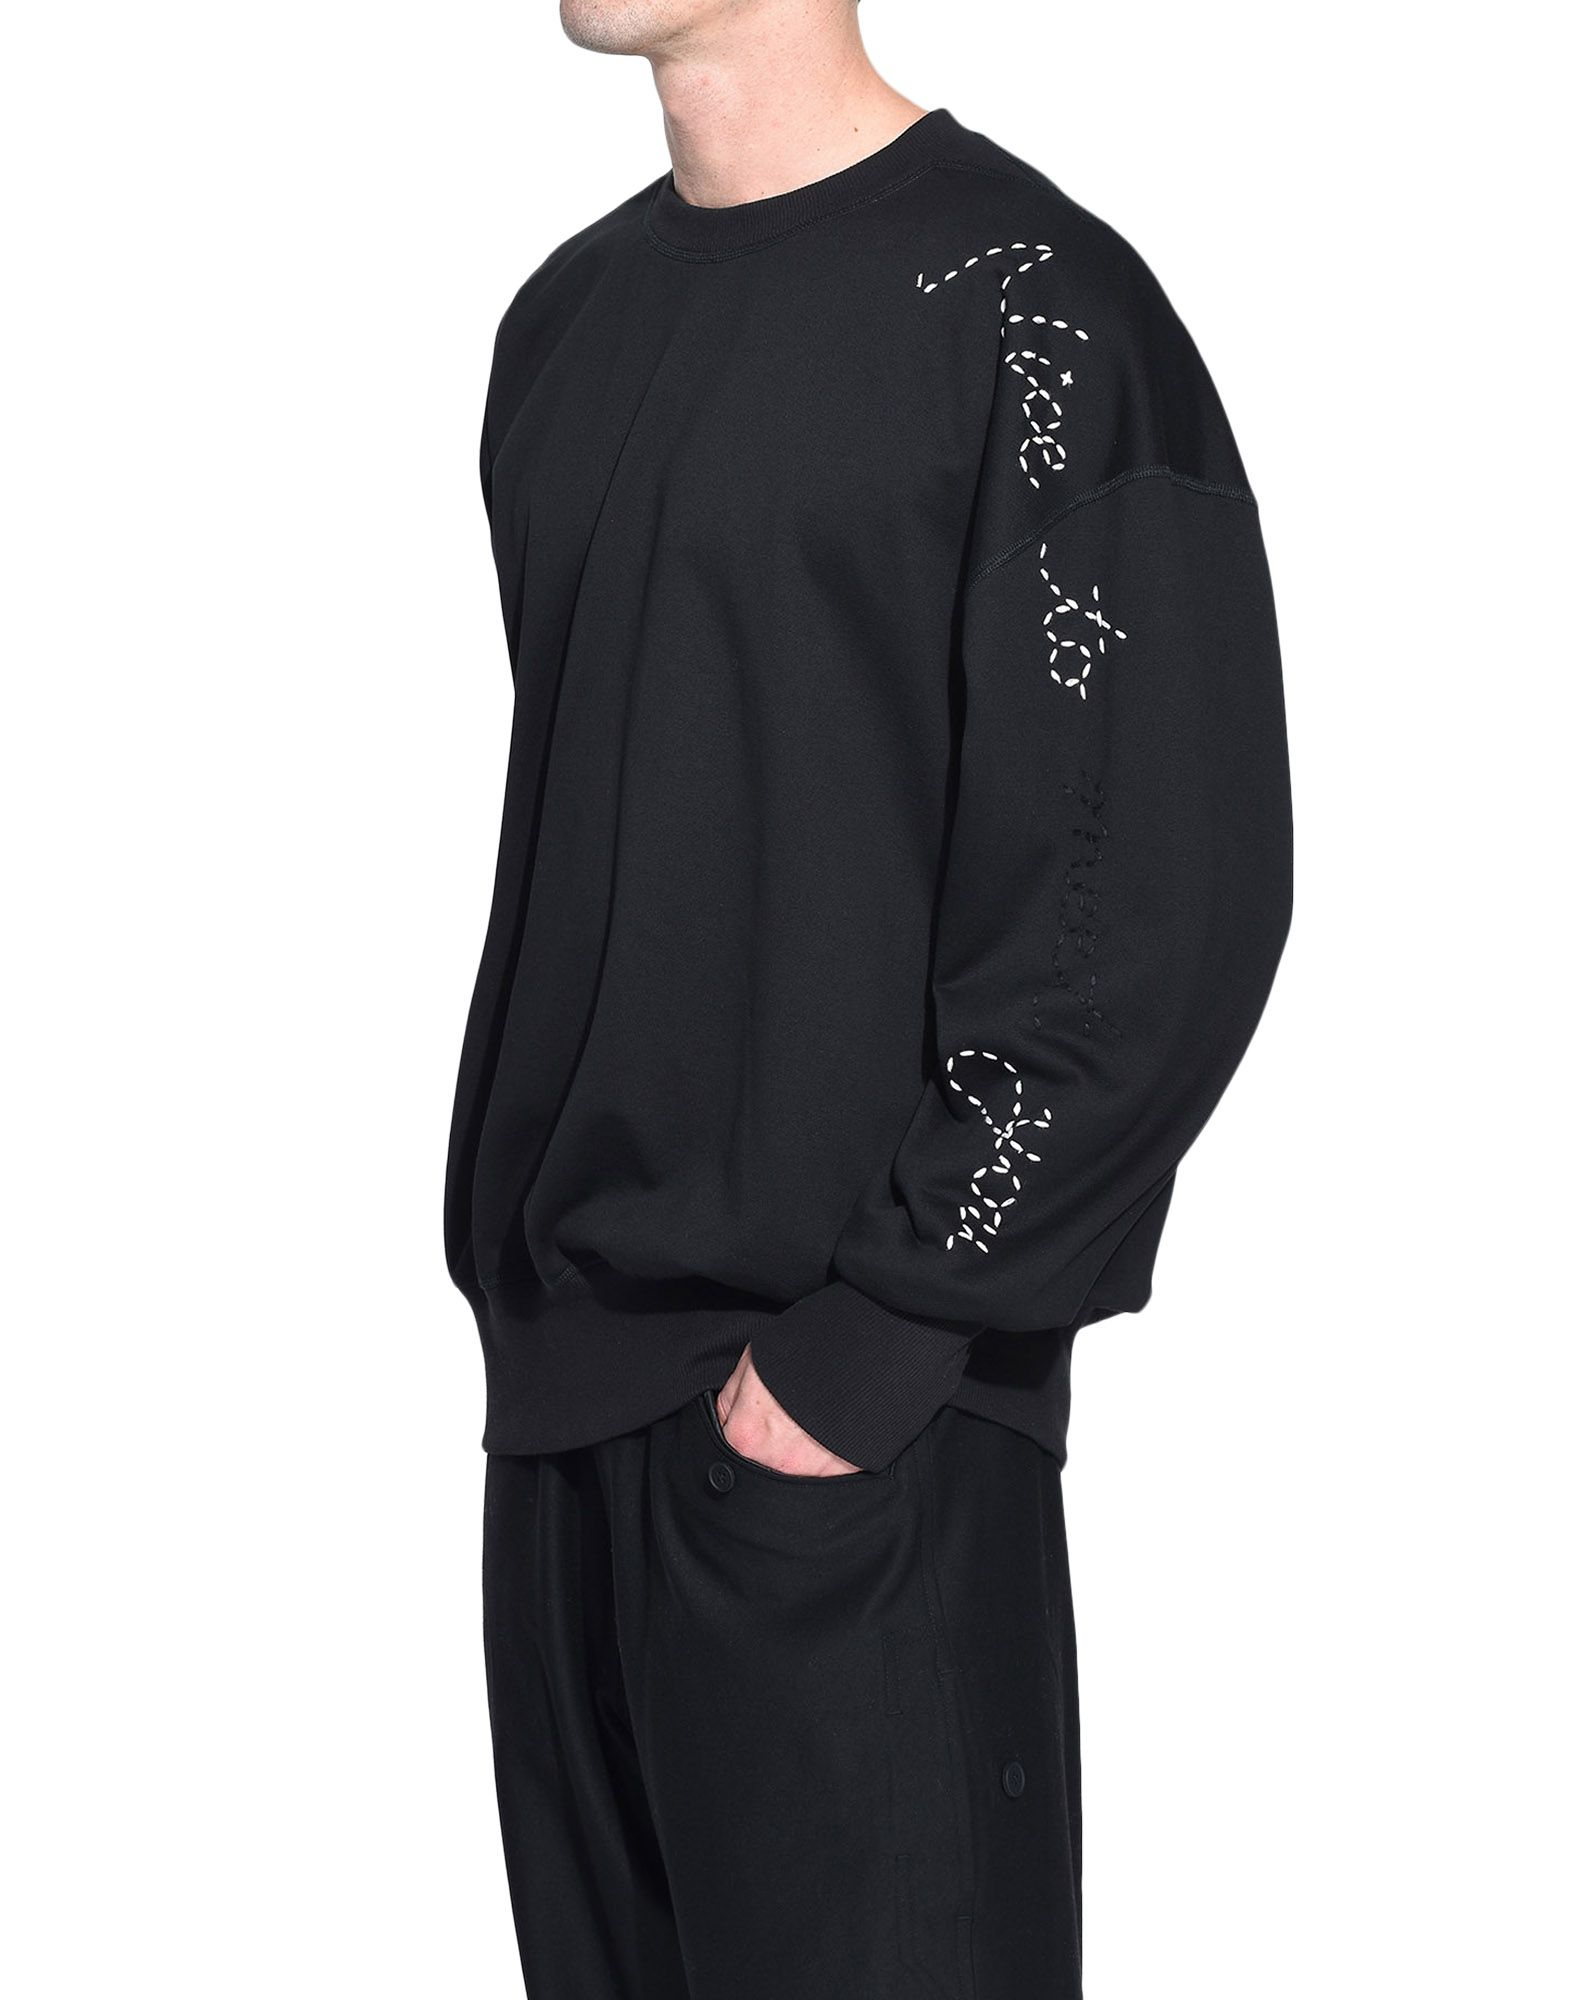 Y-3 Y-3 Sashiko Slogan Sweater Sweatshirt Man e